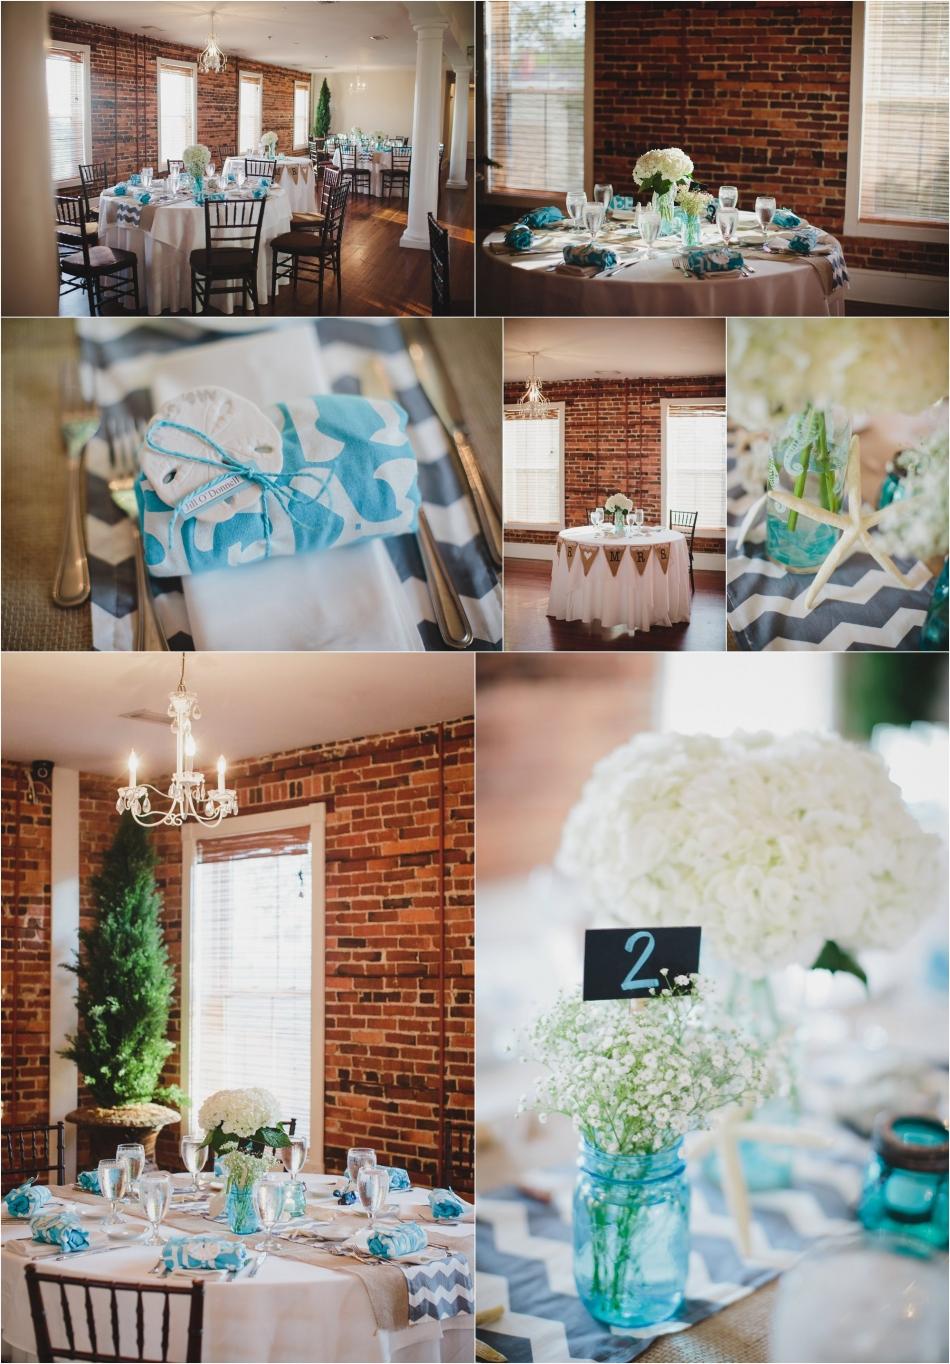 SWP-White-Room-NG-6388.jpg